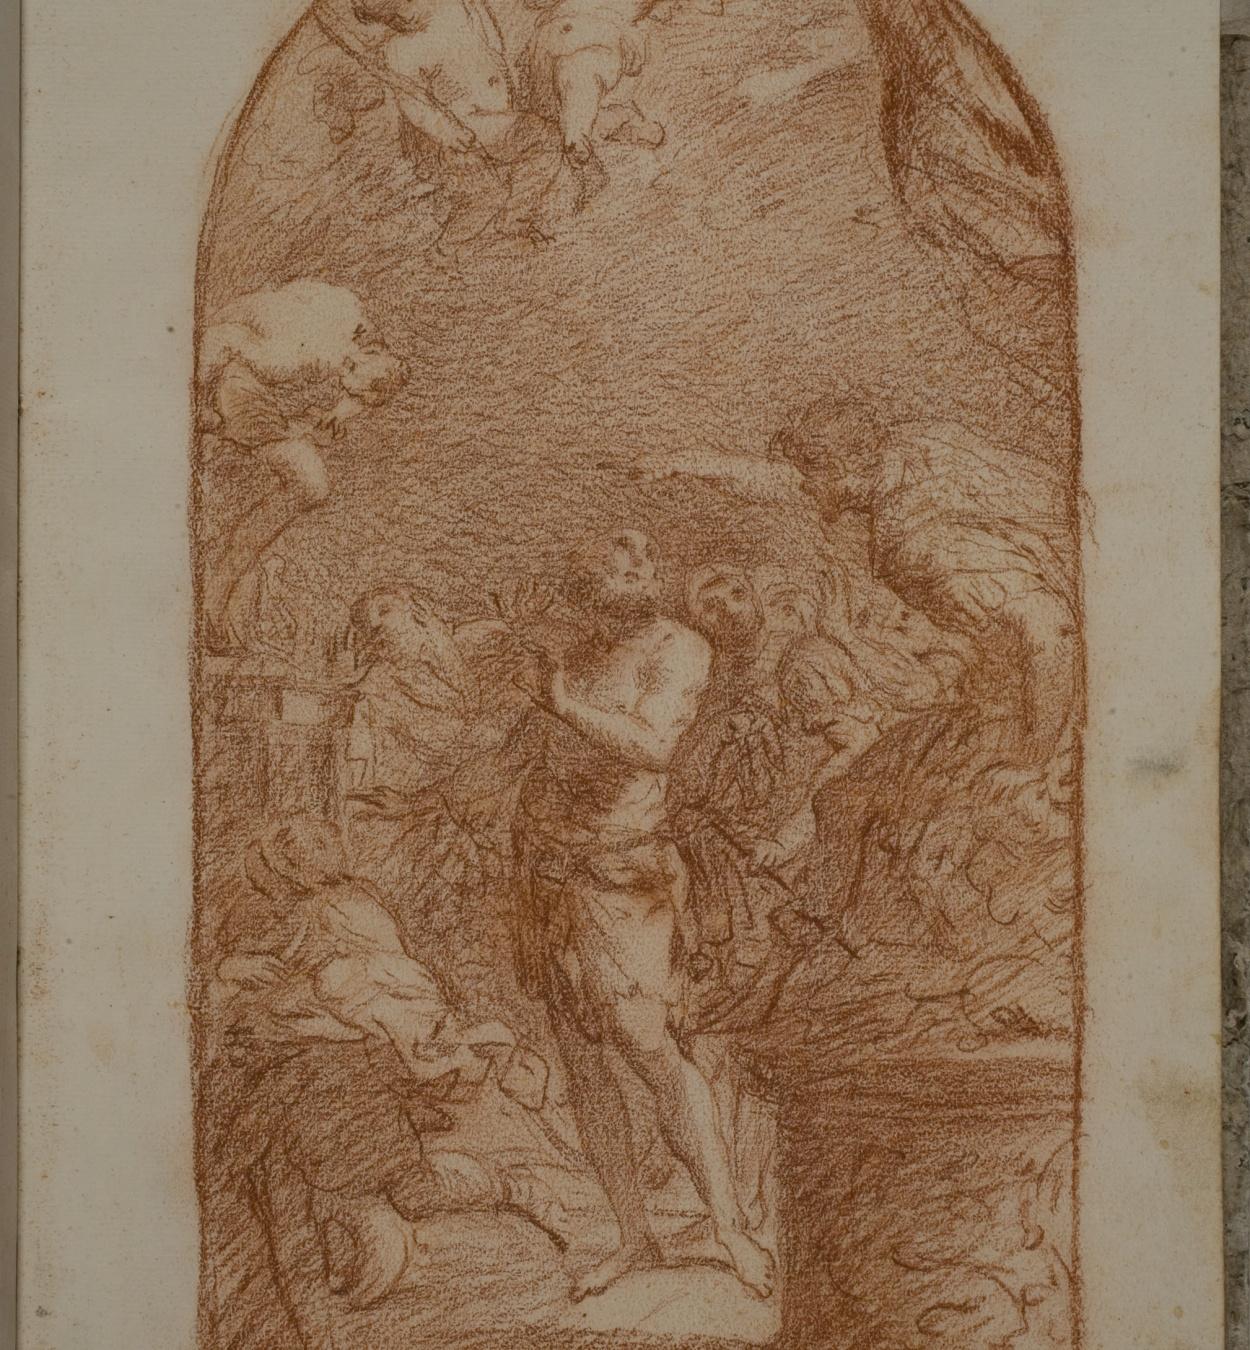 Domingo Álvarez Enciso - Roman album - Circa 1758-1762 or 1773-1789 [2]